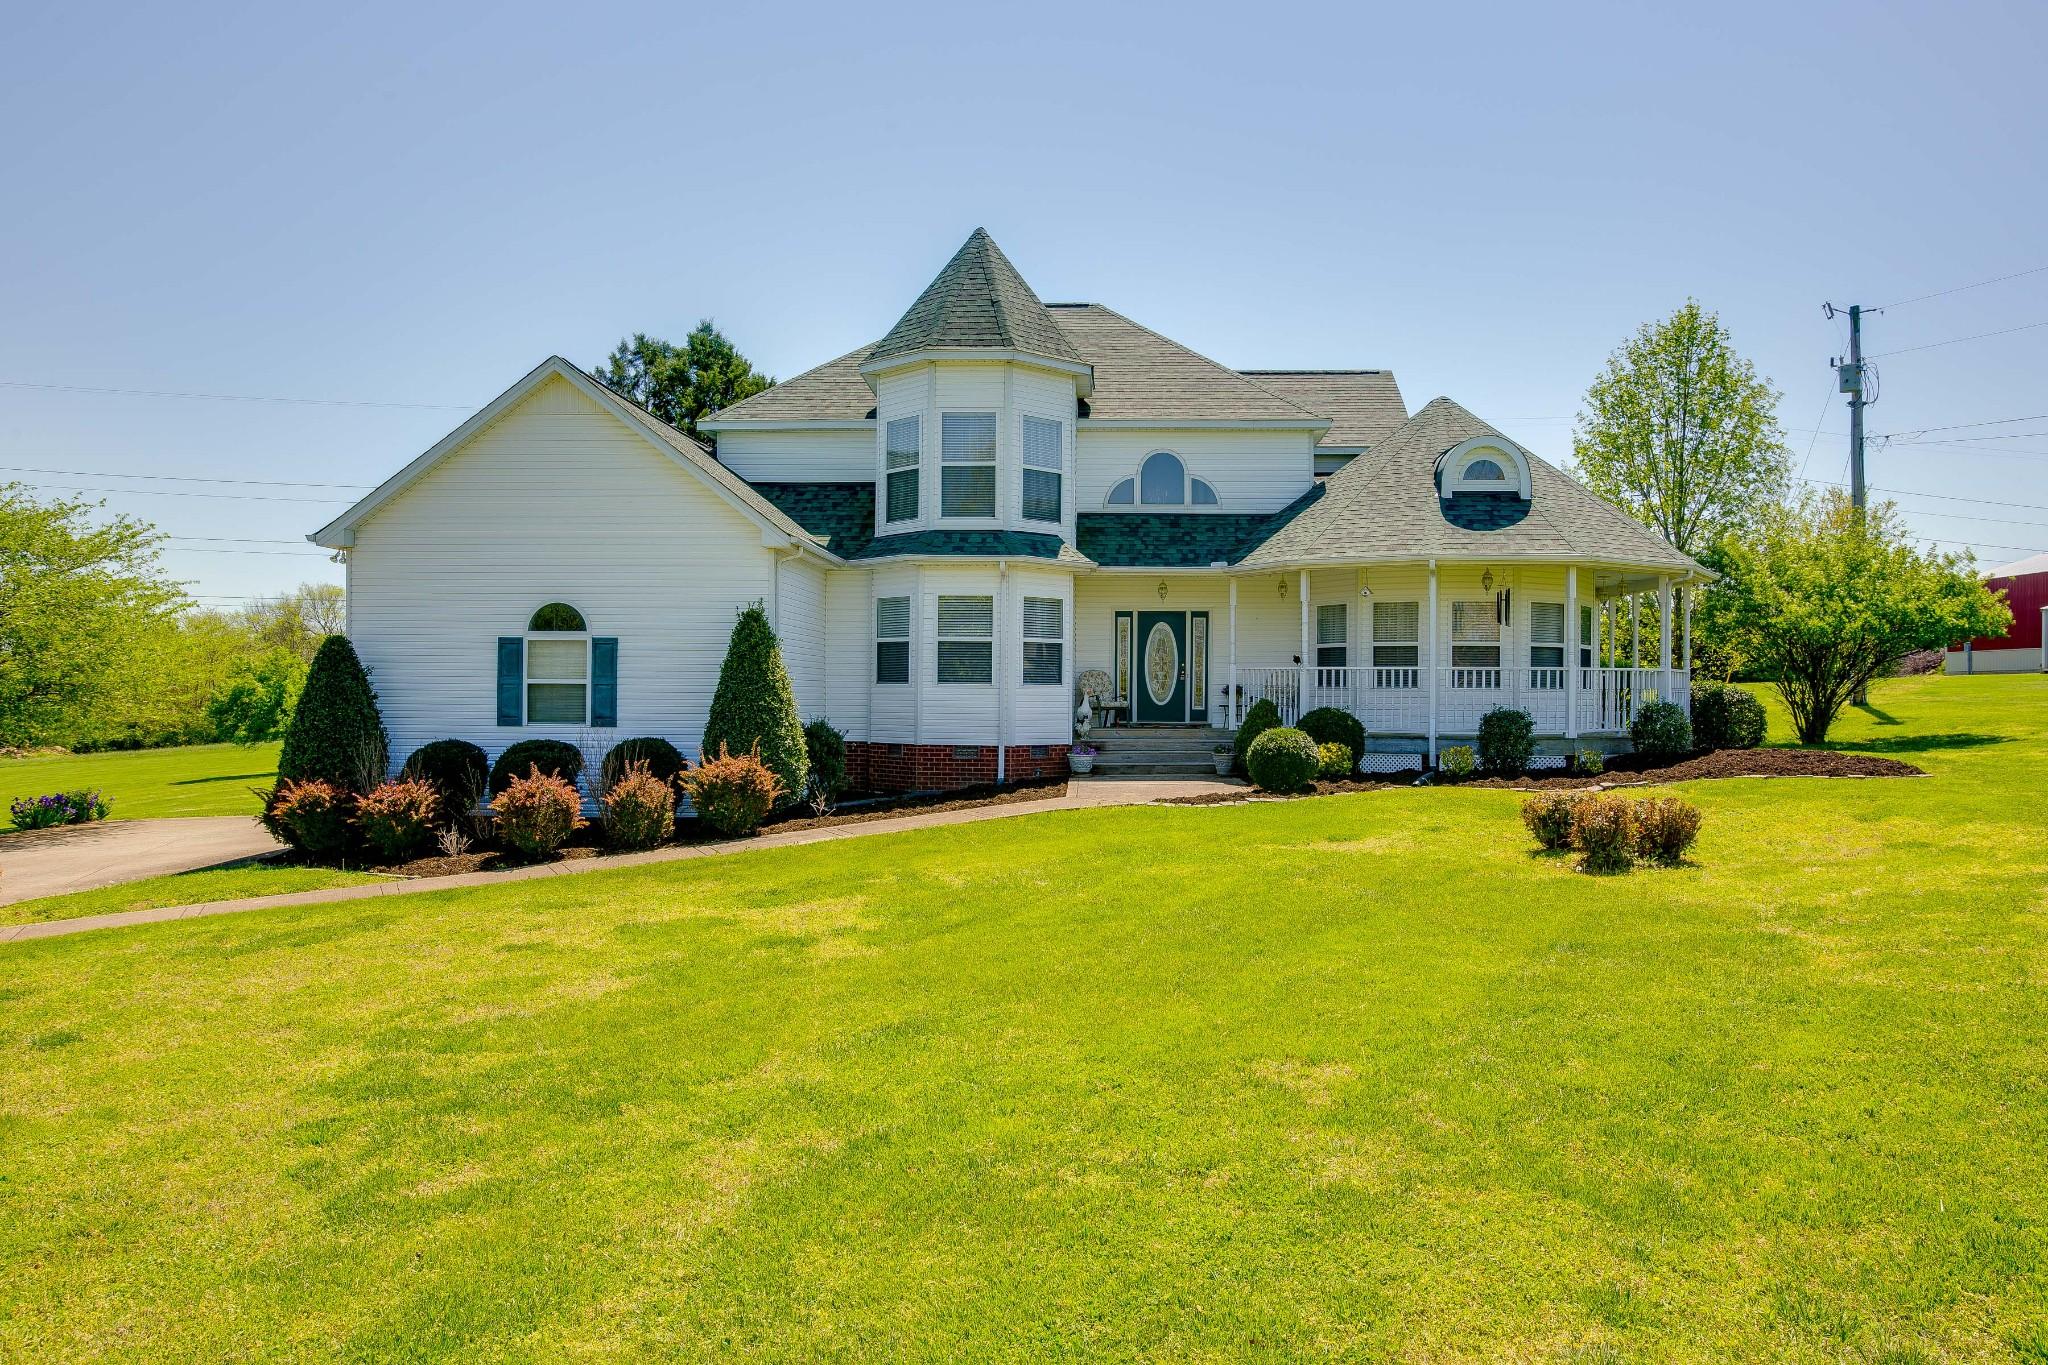 152 Akers Trl Property Photo - Gallatin, TN real estate listing